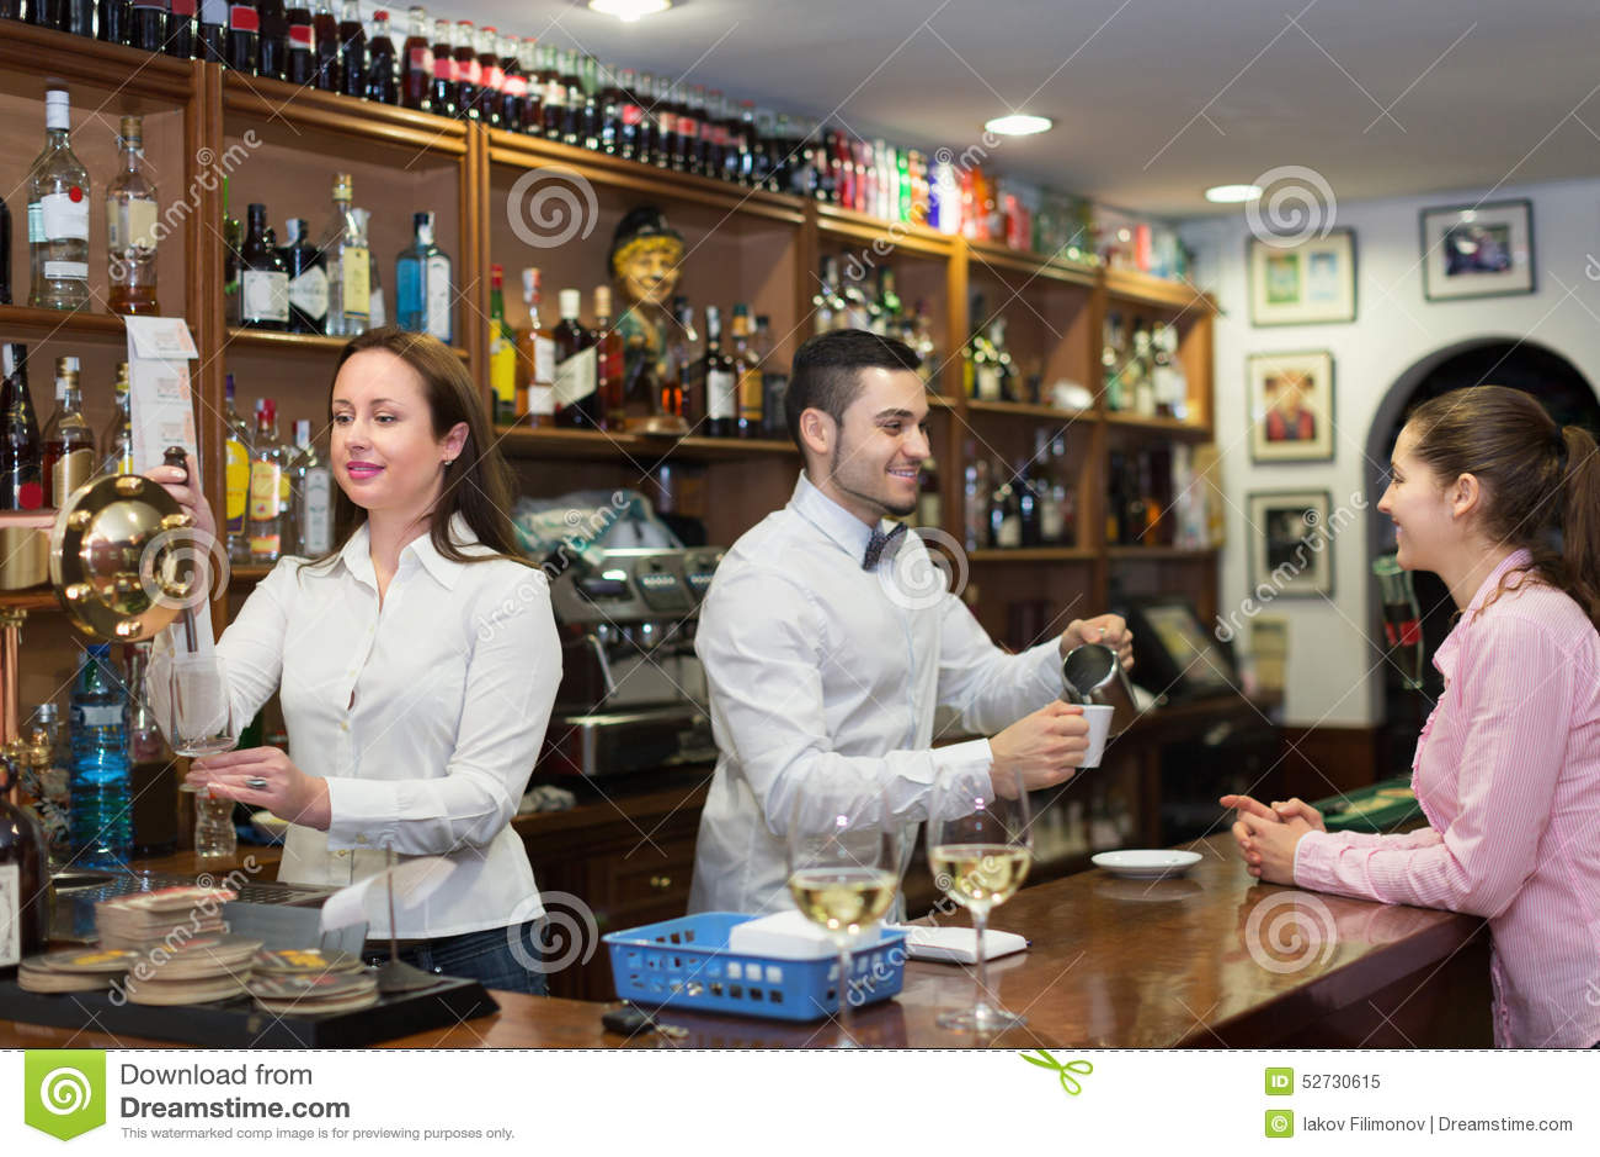 Barista Bartender